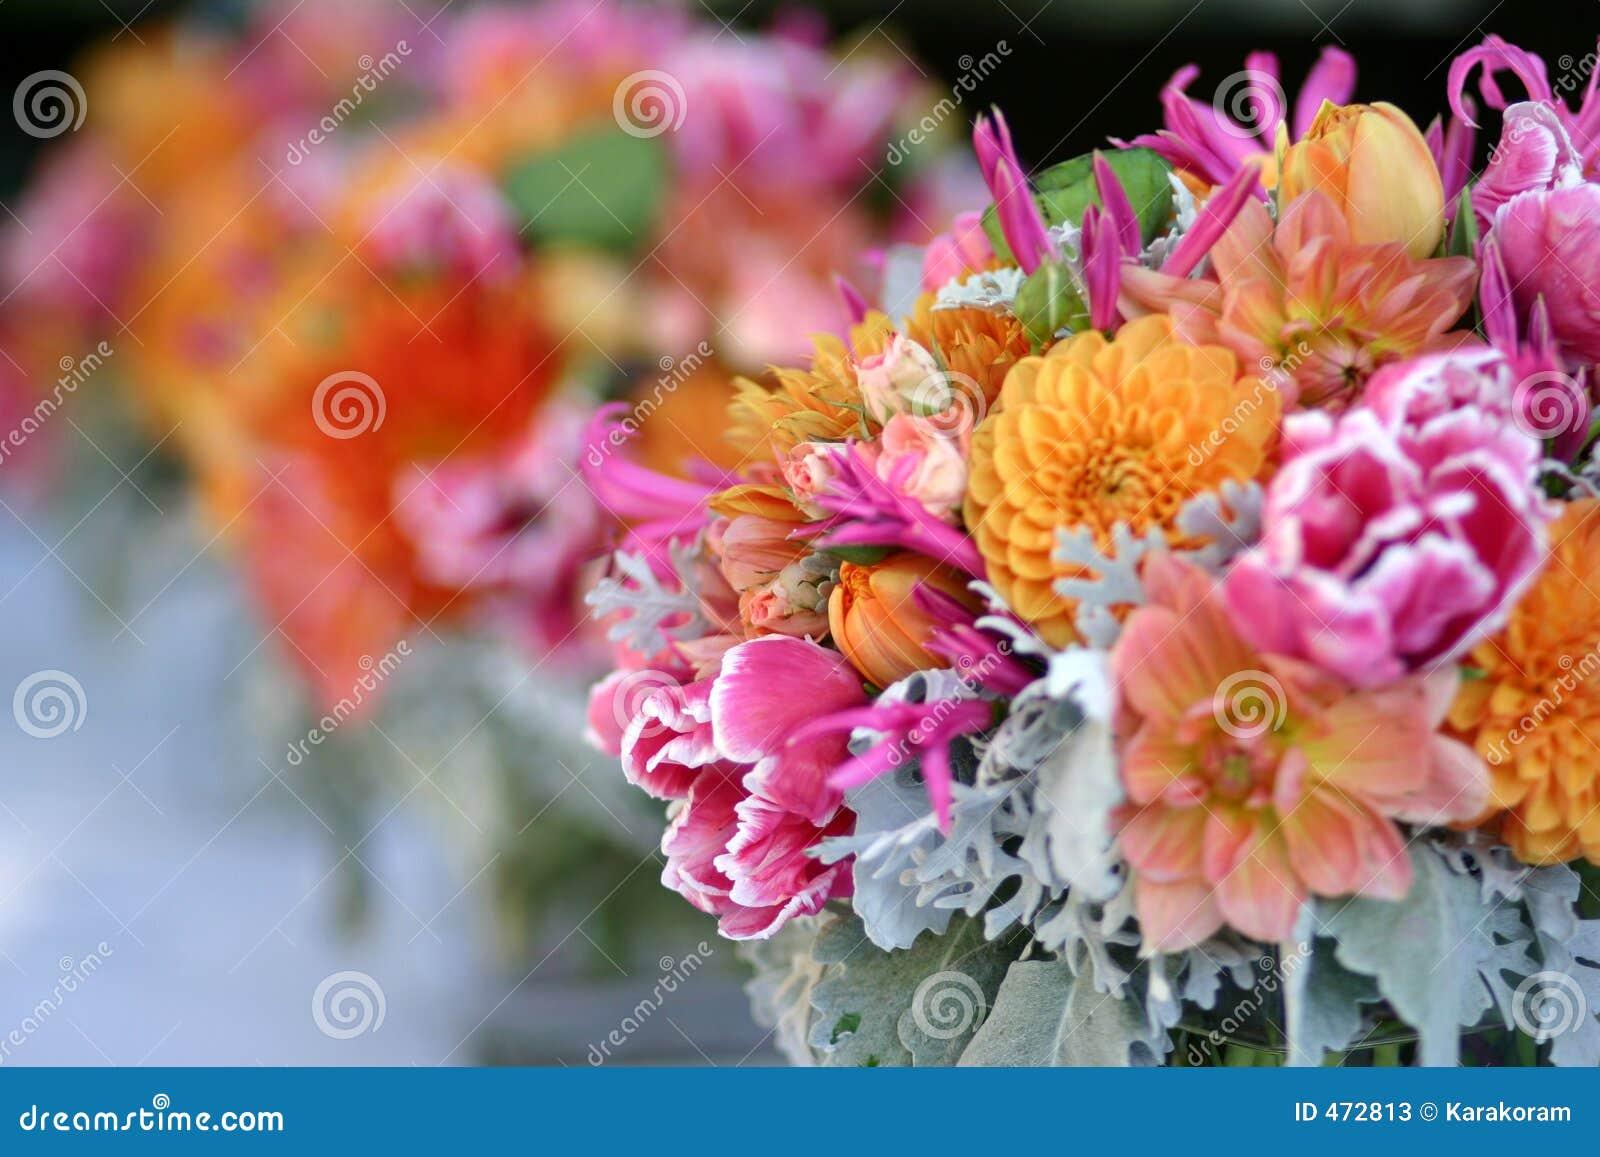 Download Flower arrangement stock image. Image of wedding, design - 472813